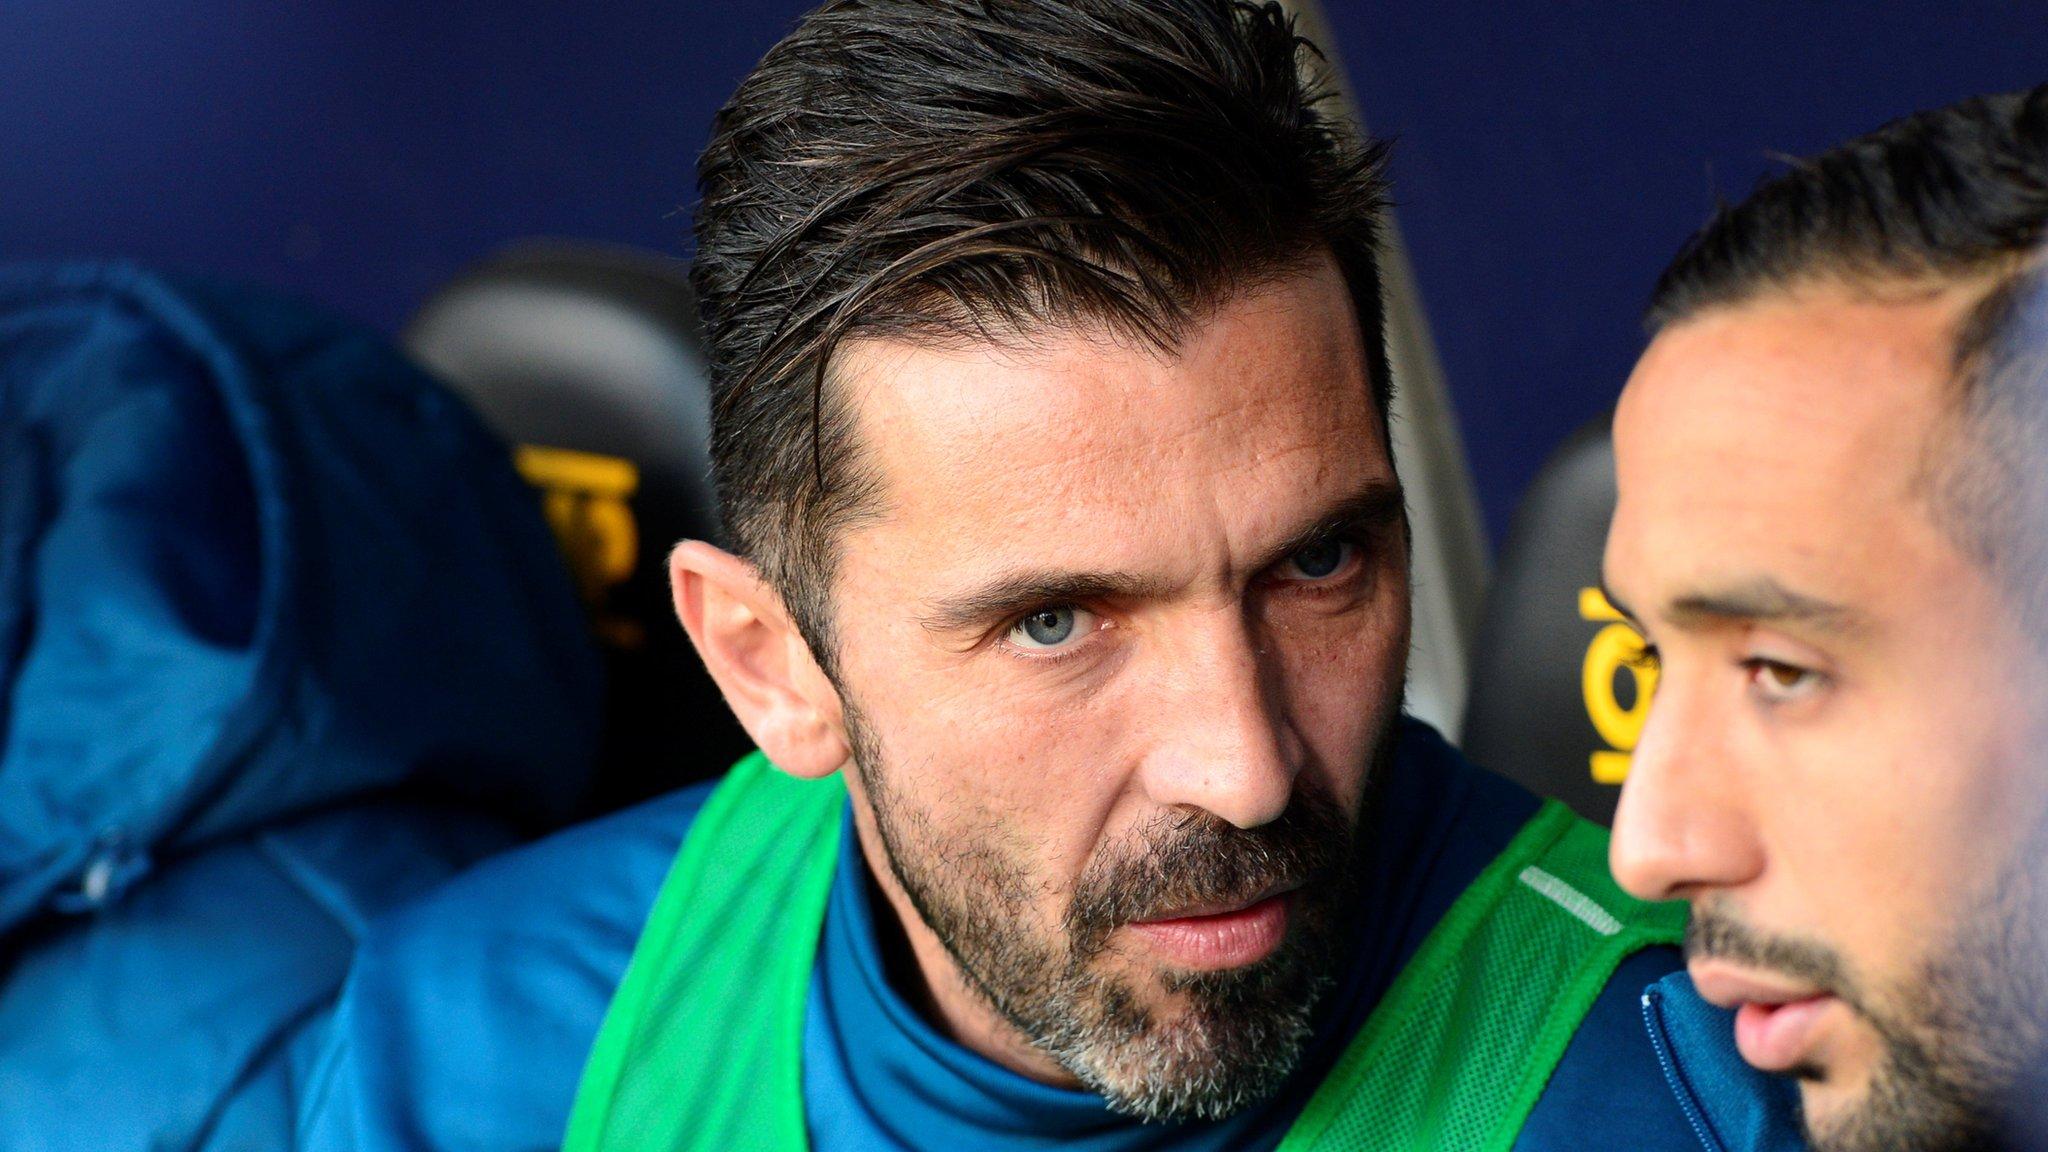 Juventus lose to Sampdoria after resting Buffon